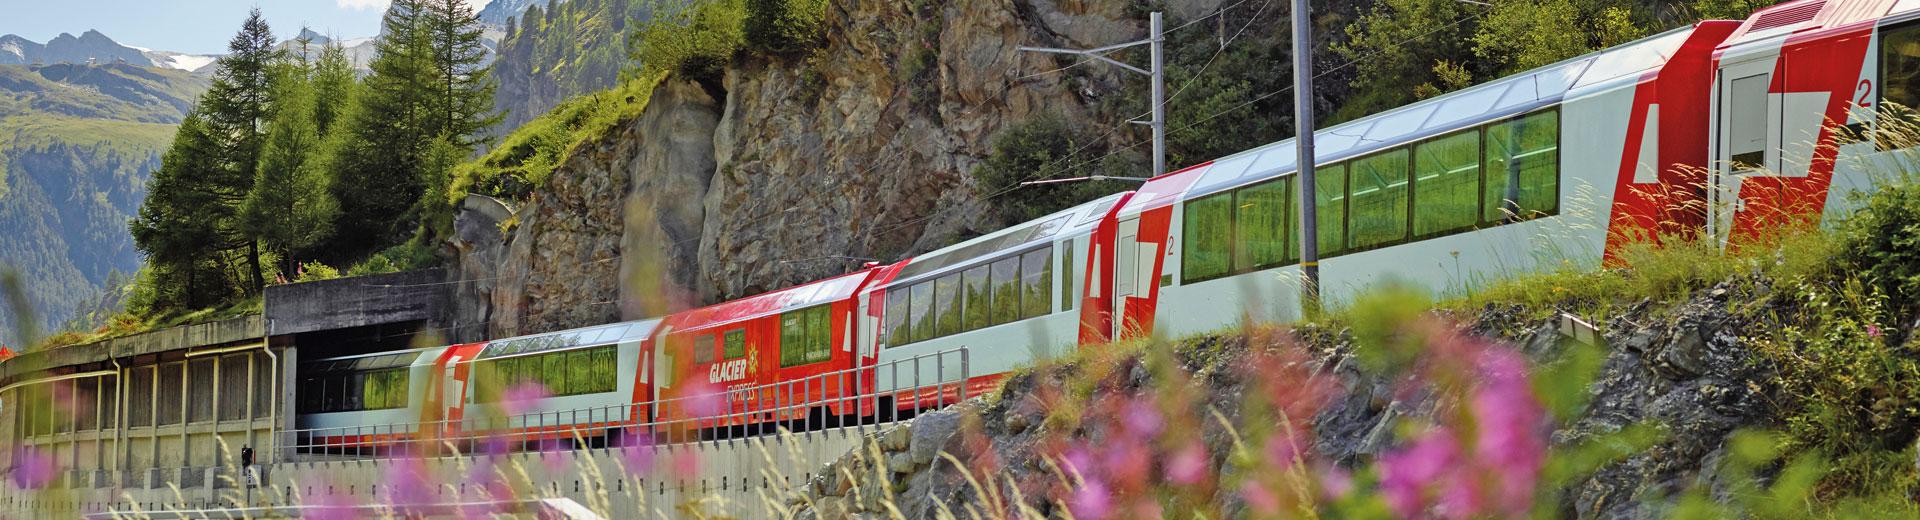 Voyages en groupe Glacier Express - Package Select